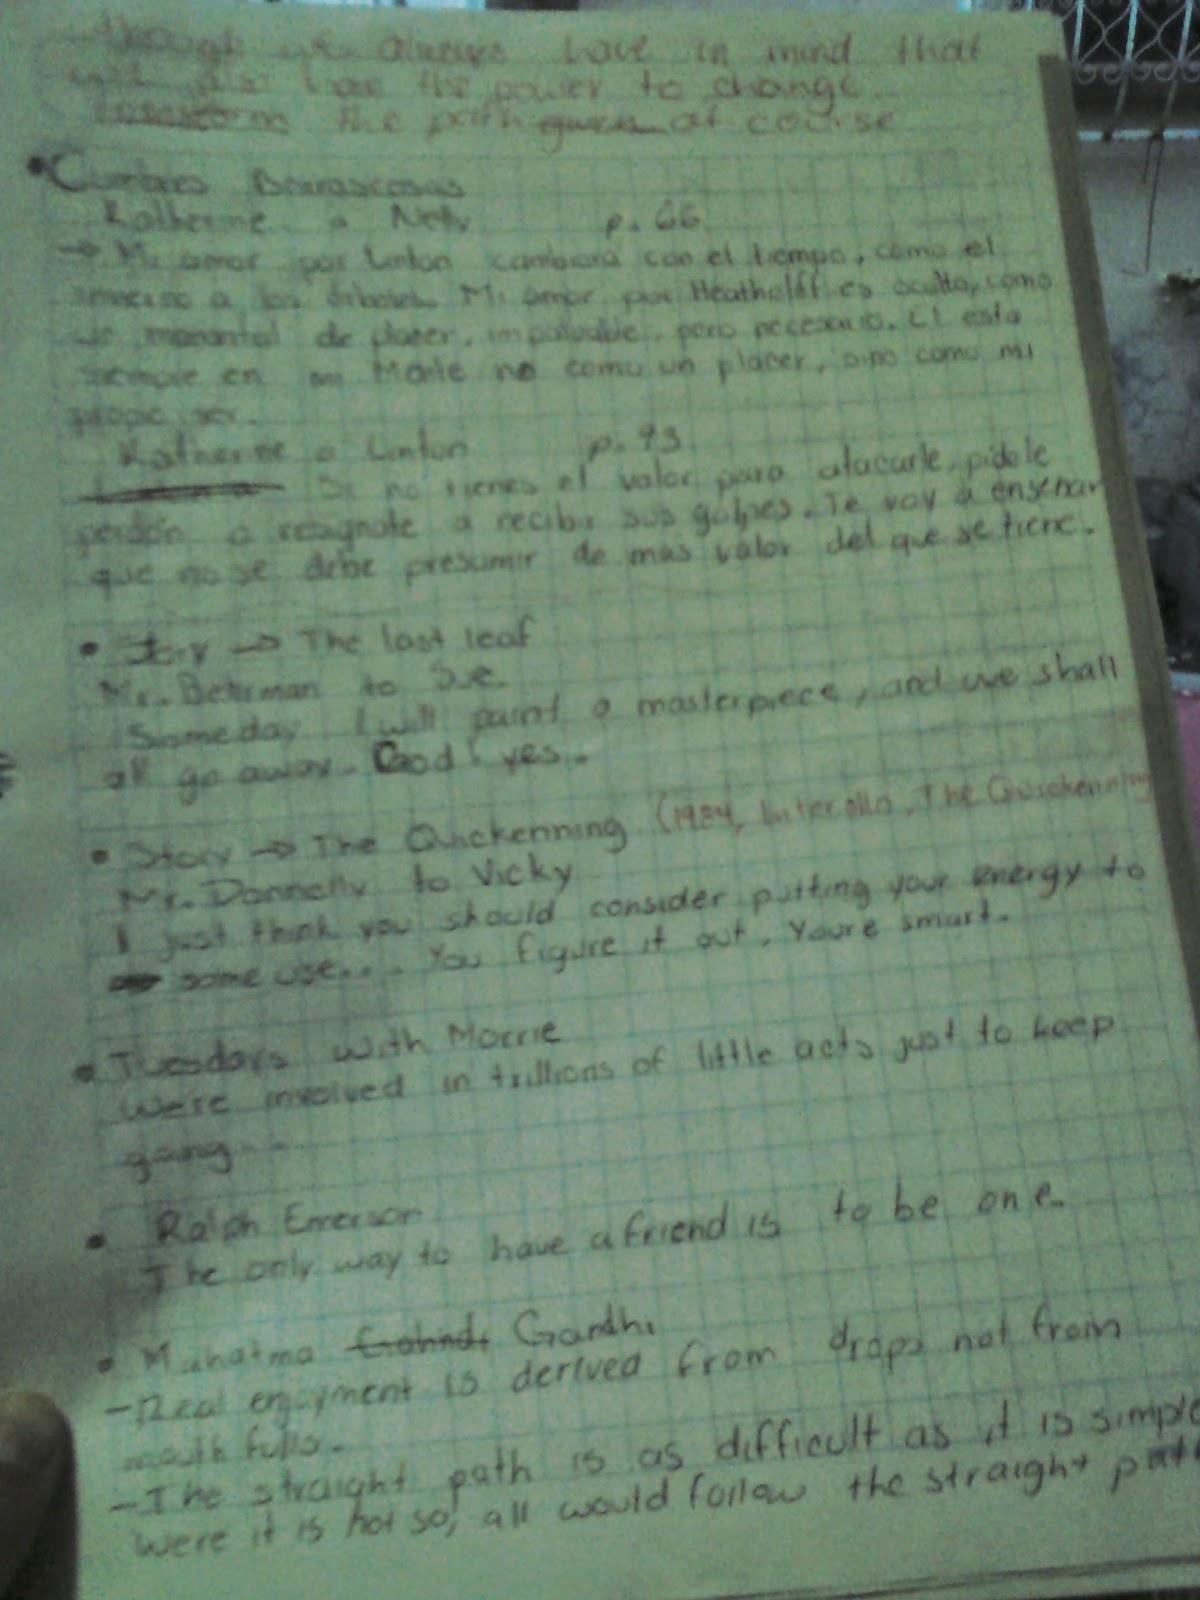 susana alicia torres garcia tuti destiny and love essay